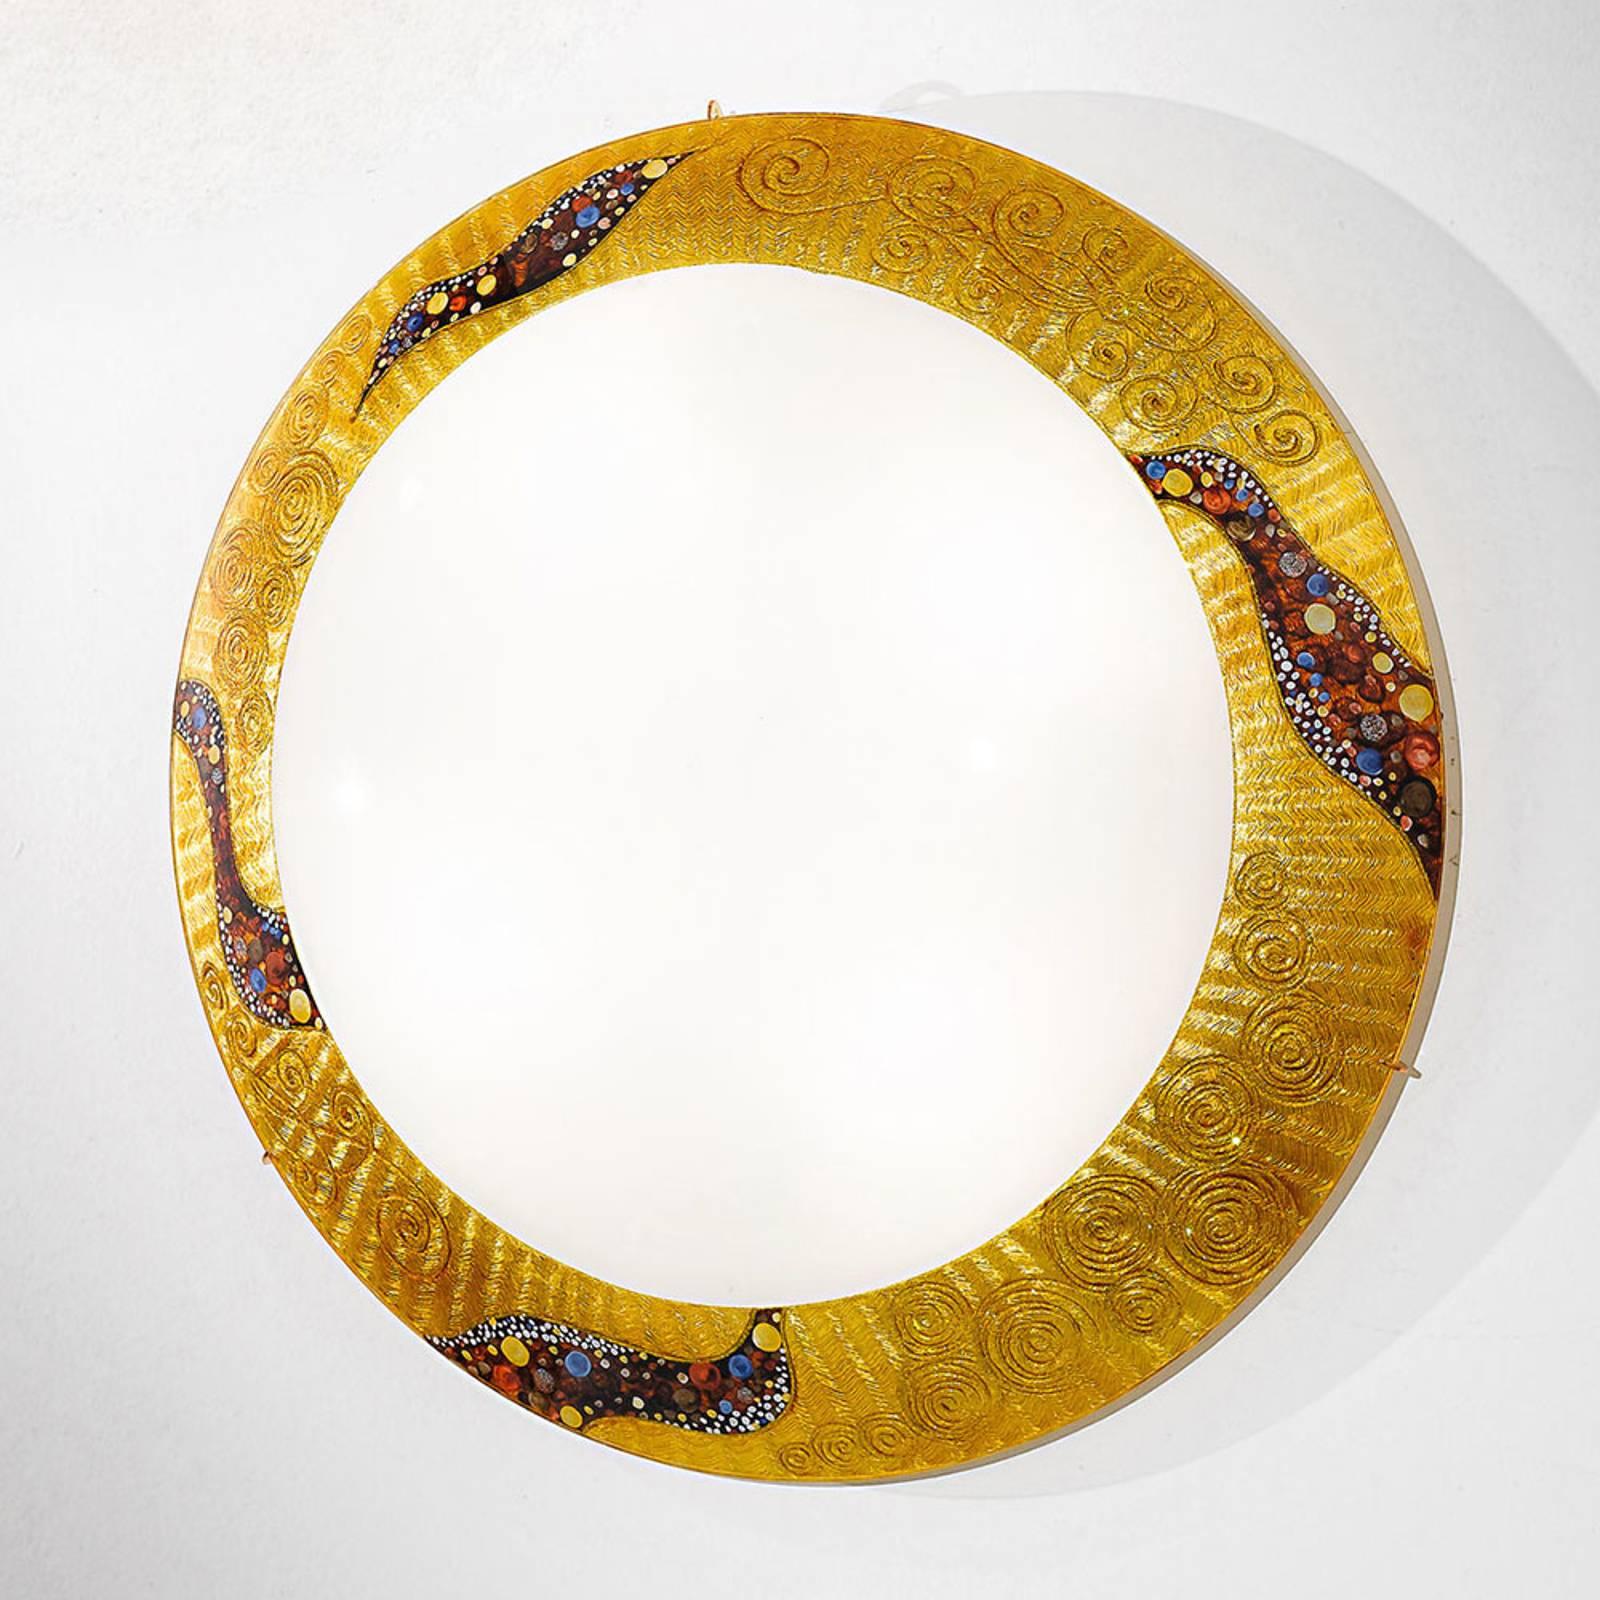 KOLARZ Serena Kiss goud wandlamp 24 kt, Ø 50 cm